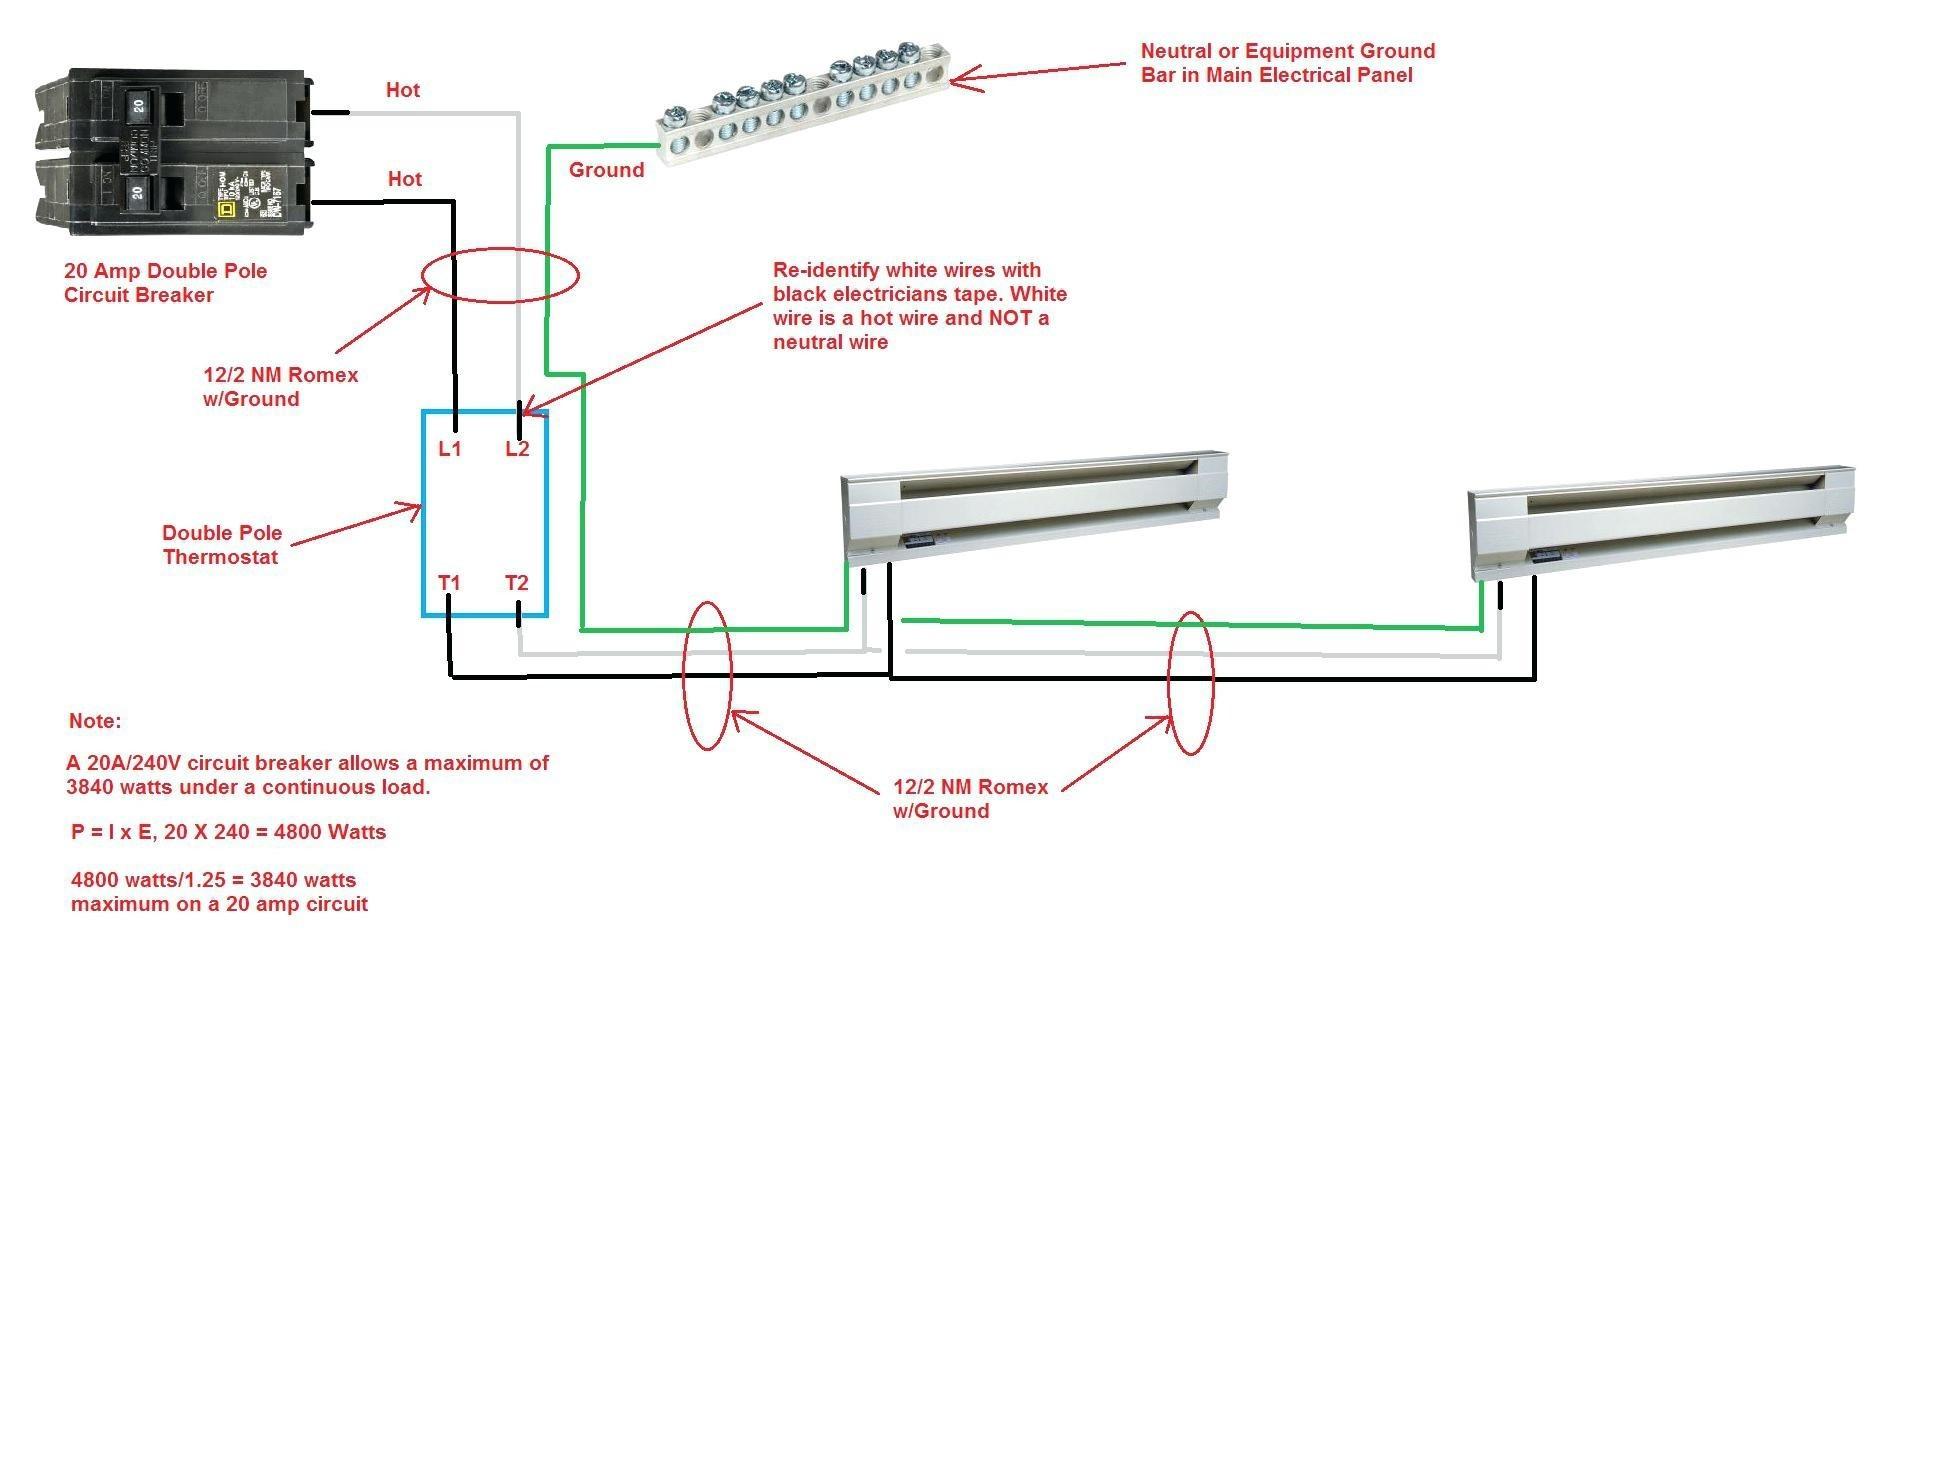 hight resolution of baseboard wiring diagram best of wiring diagram image electrical wiring diagrams for dummies fahrenheit wiring diagram